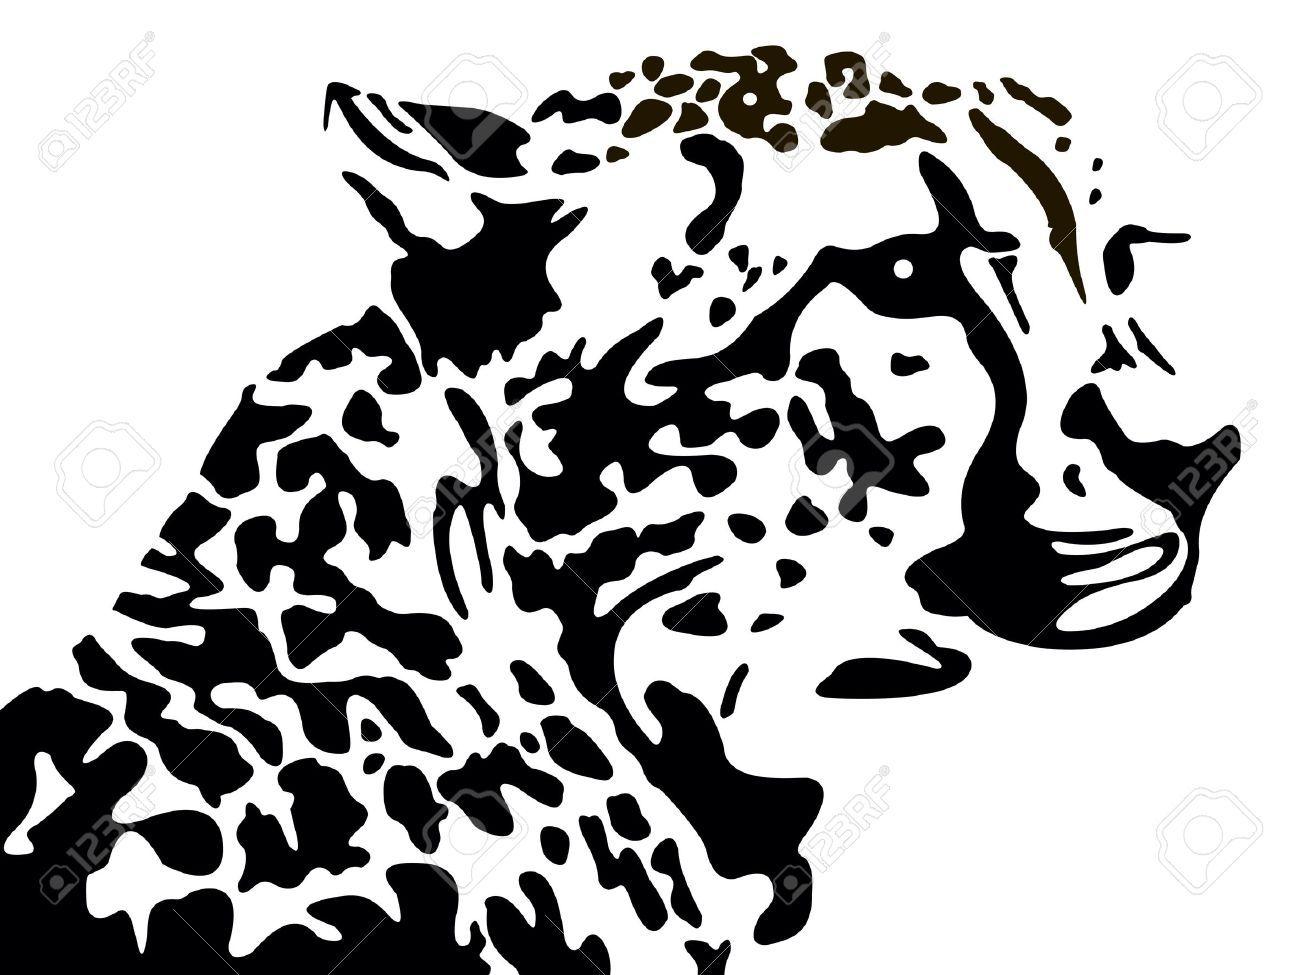 Leopard Silhouette Heads Vectors Google Search Tier Schablone Tier Silhouette Pyrographie Ideen